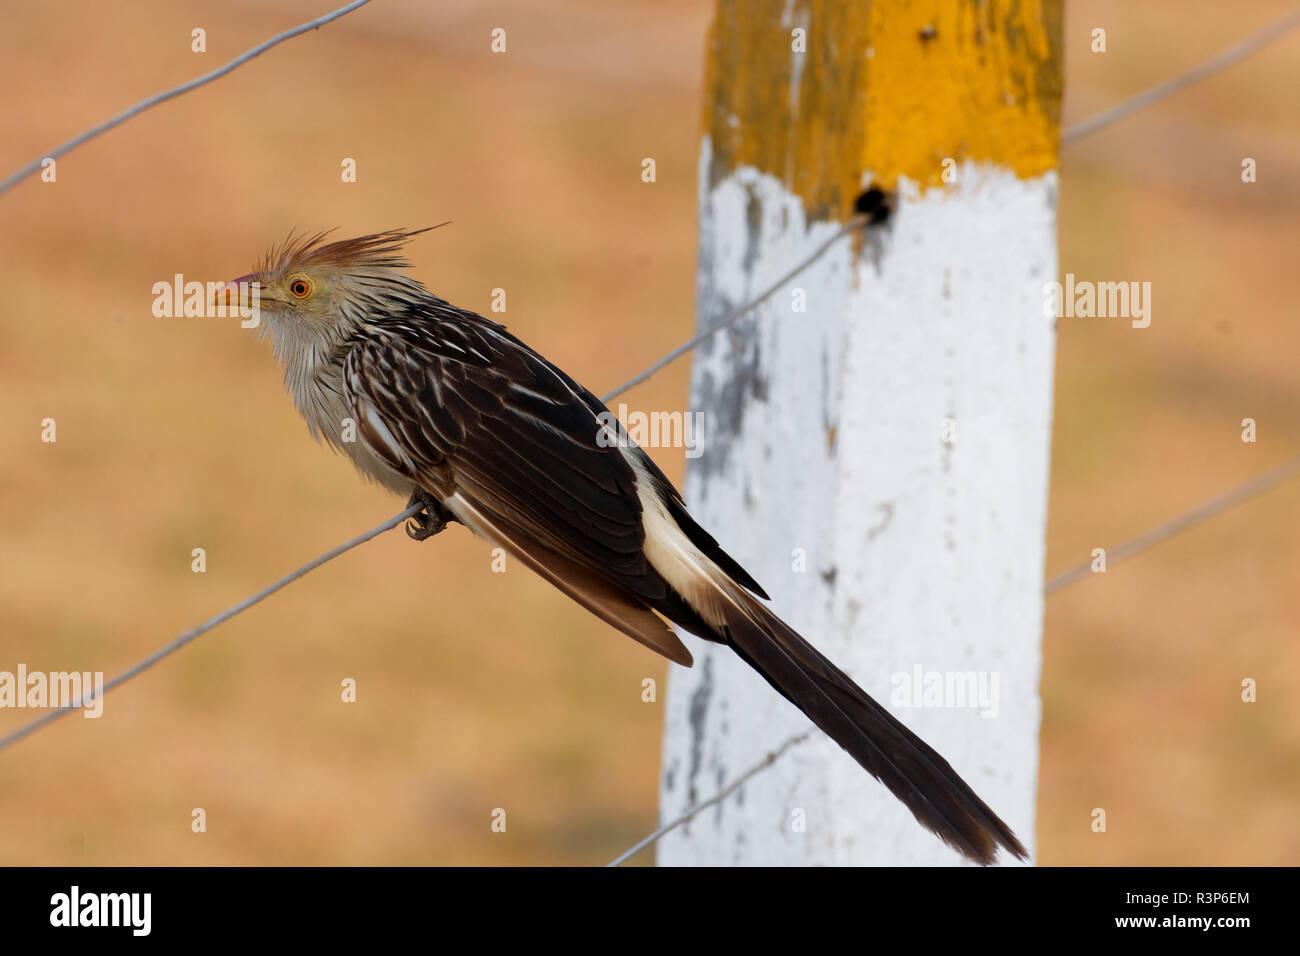 Guira Cuckoo (Guira guira) on a wire, Pantanal, Brazil - Stock Image